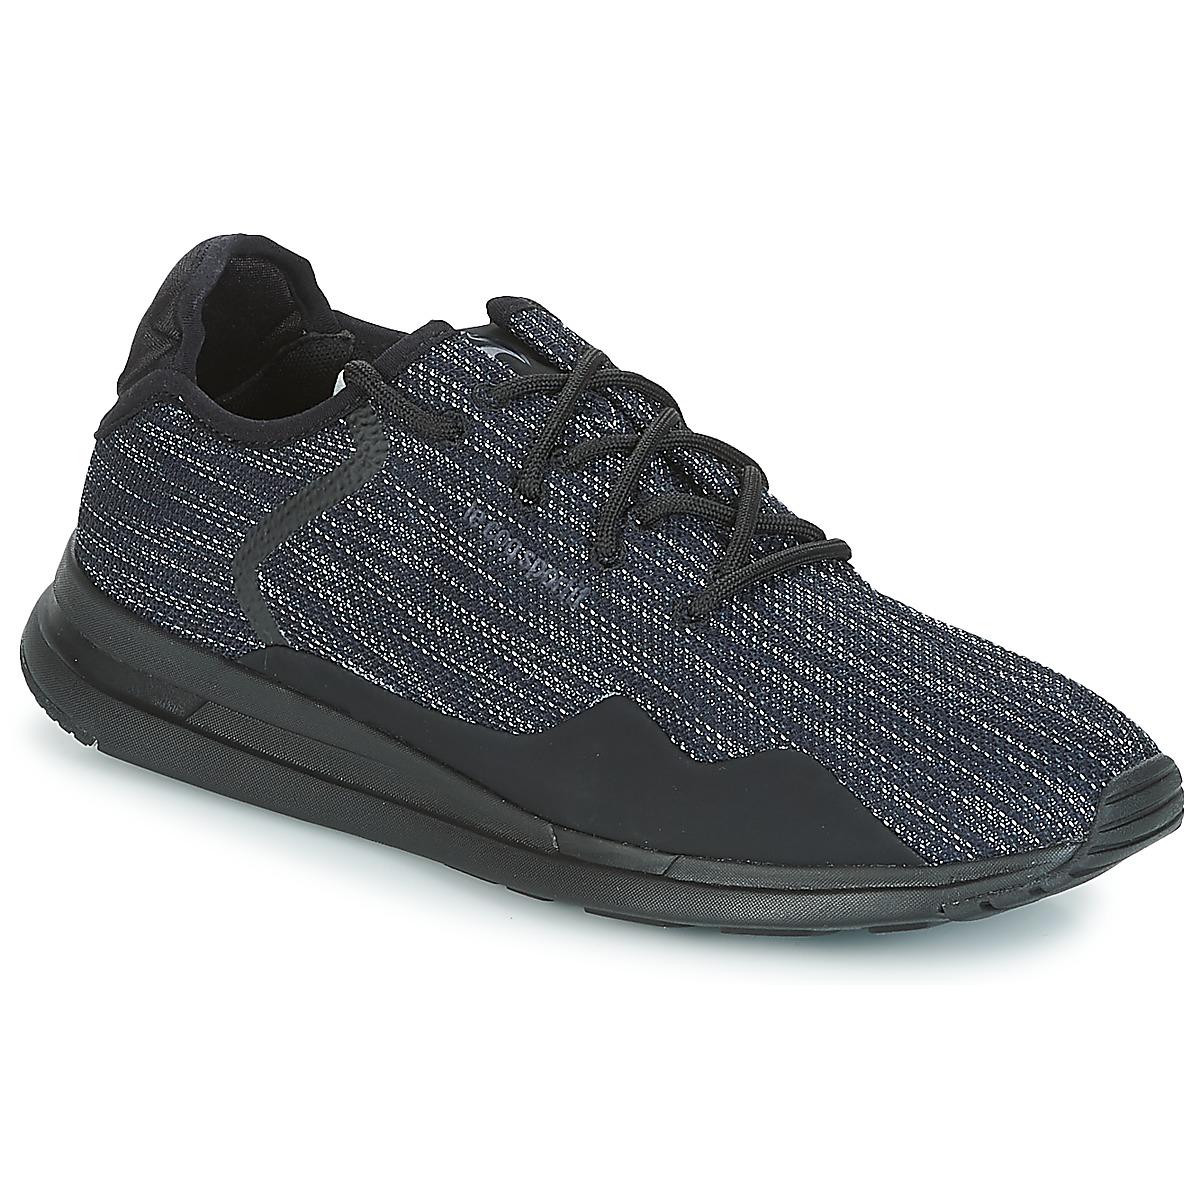 Le Coq Sportif SOLAS PREMIUM Triple / Schwarz - Kostenloser Versand bei Spartoode ! - Schuhe Sneaker Low Herren 89,99 €